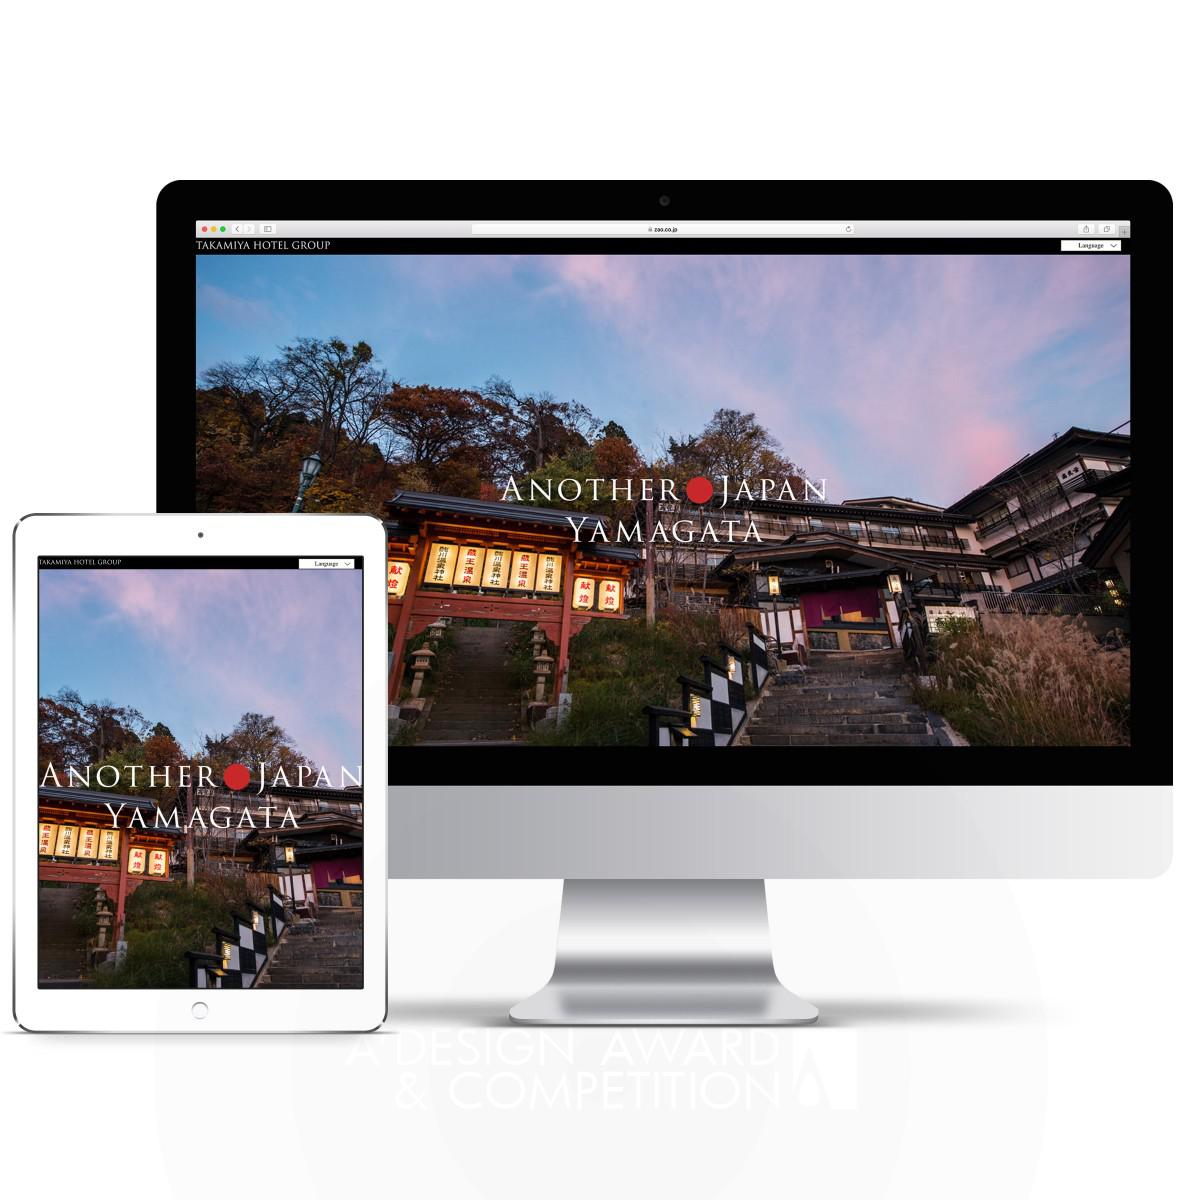 Another Japan Yamagata Website